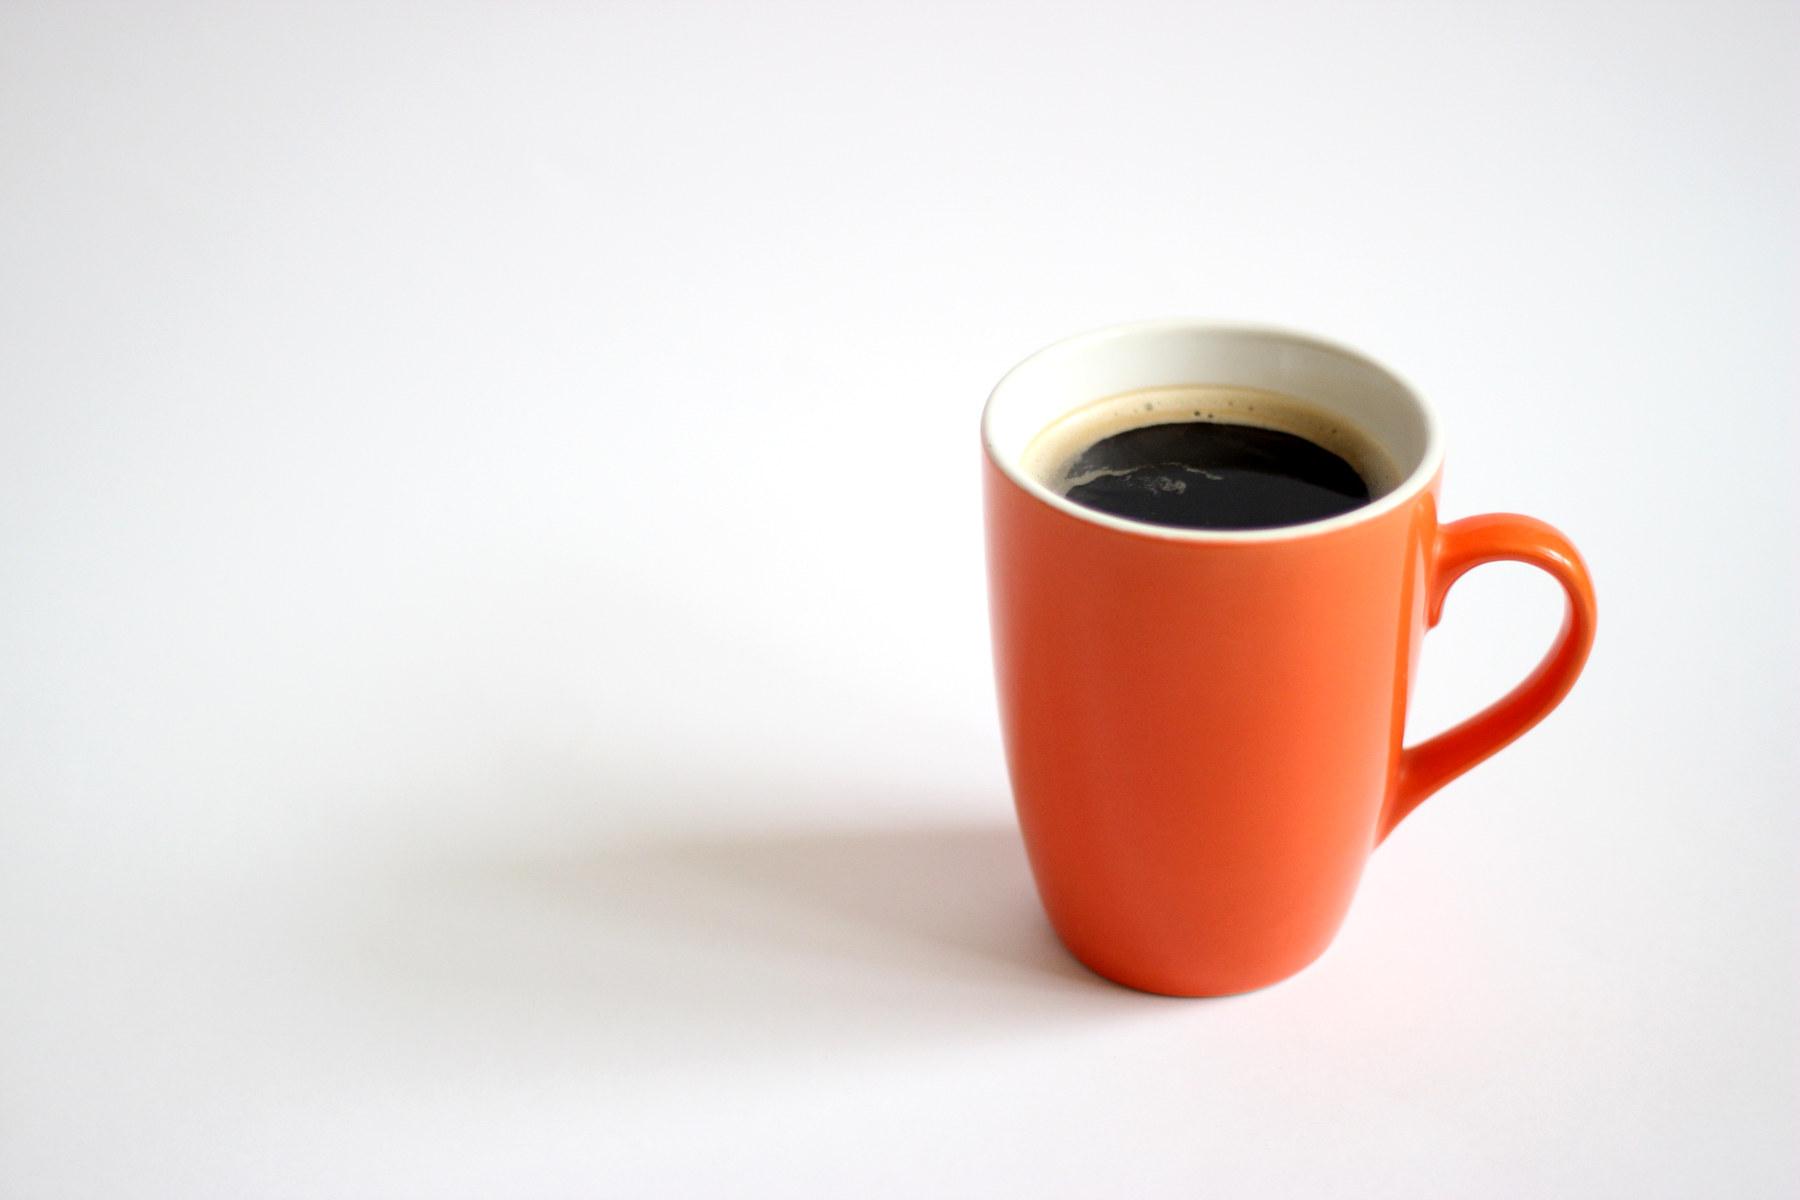 hot coffee white background - photo #20